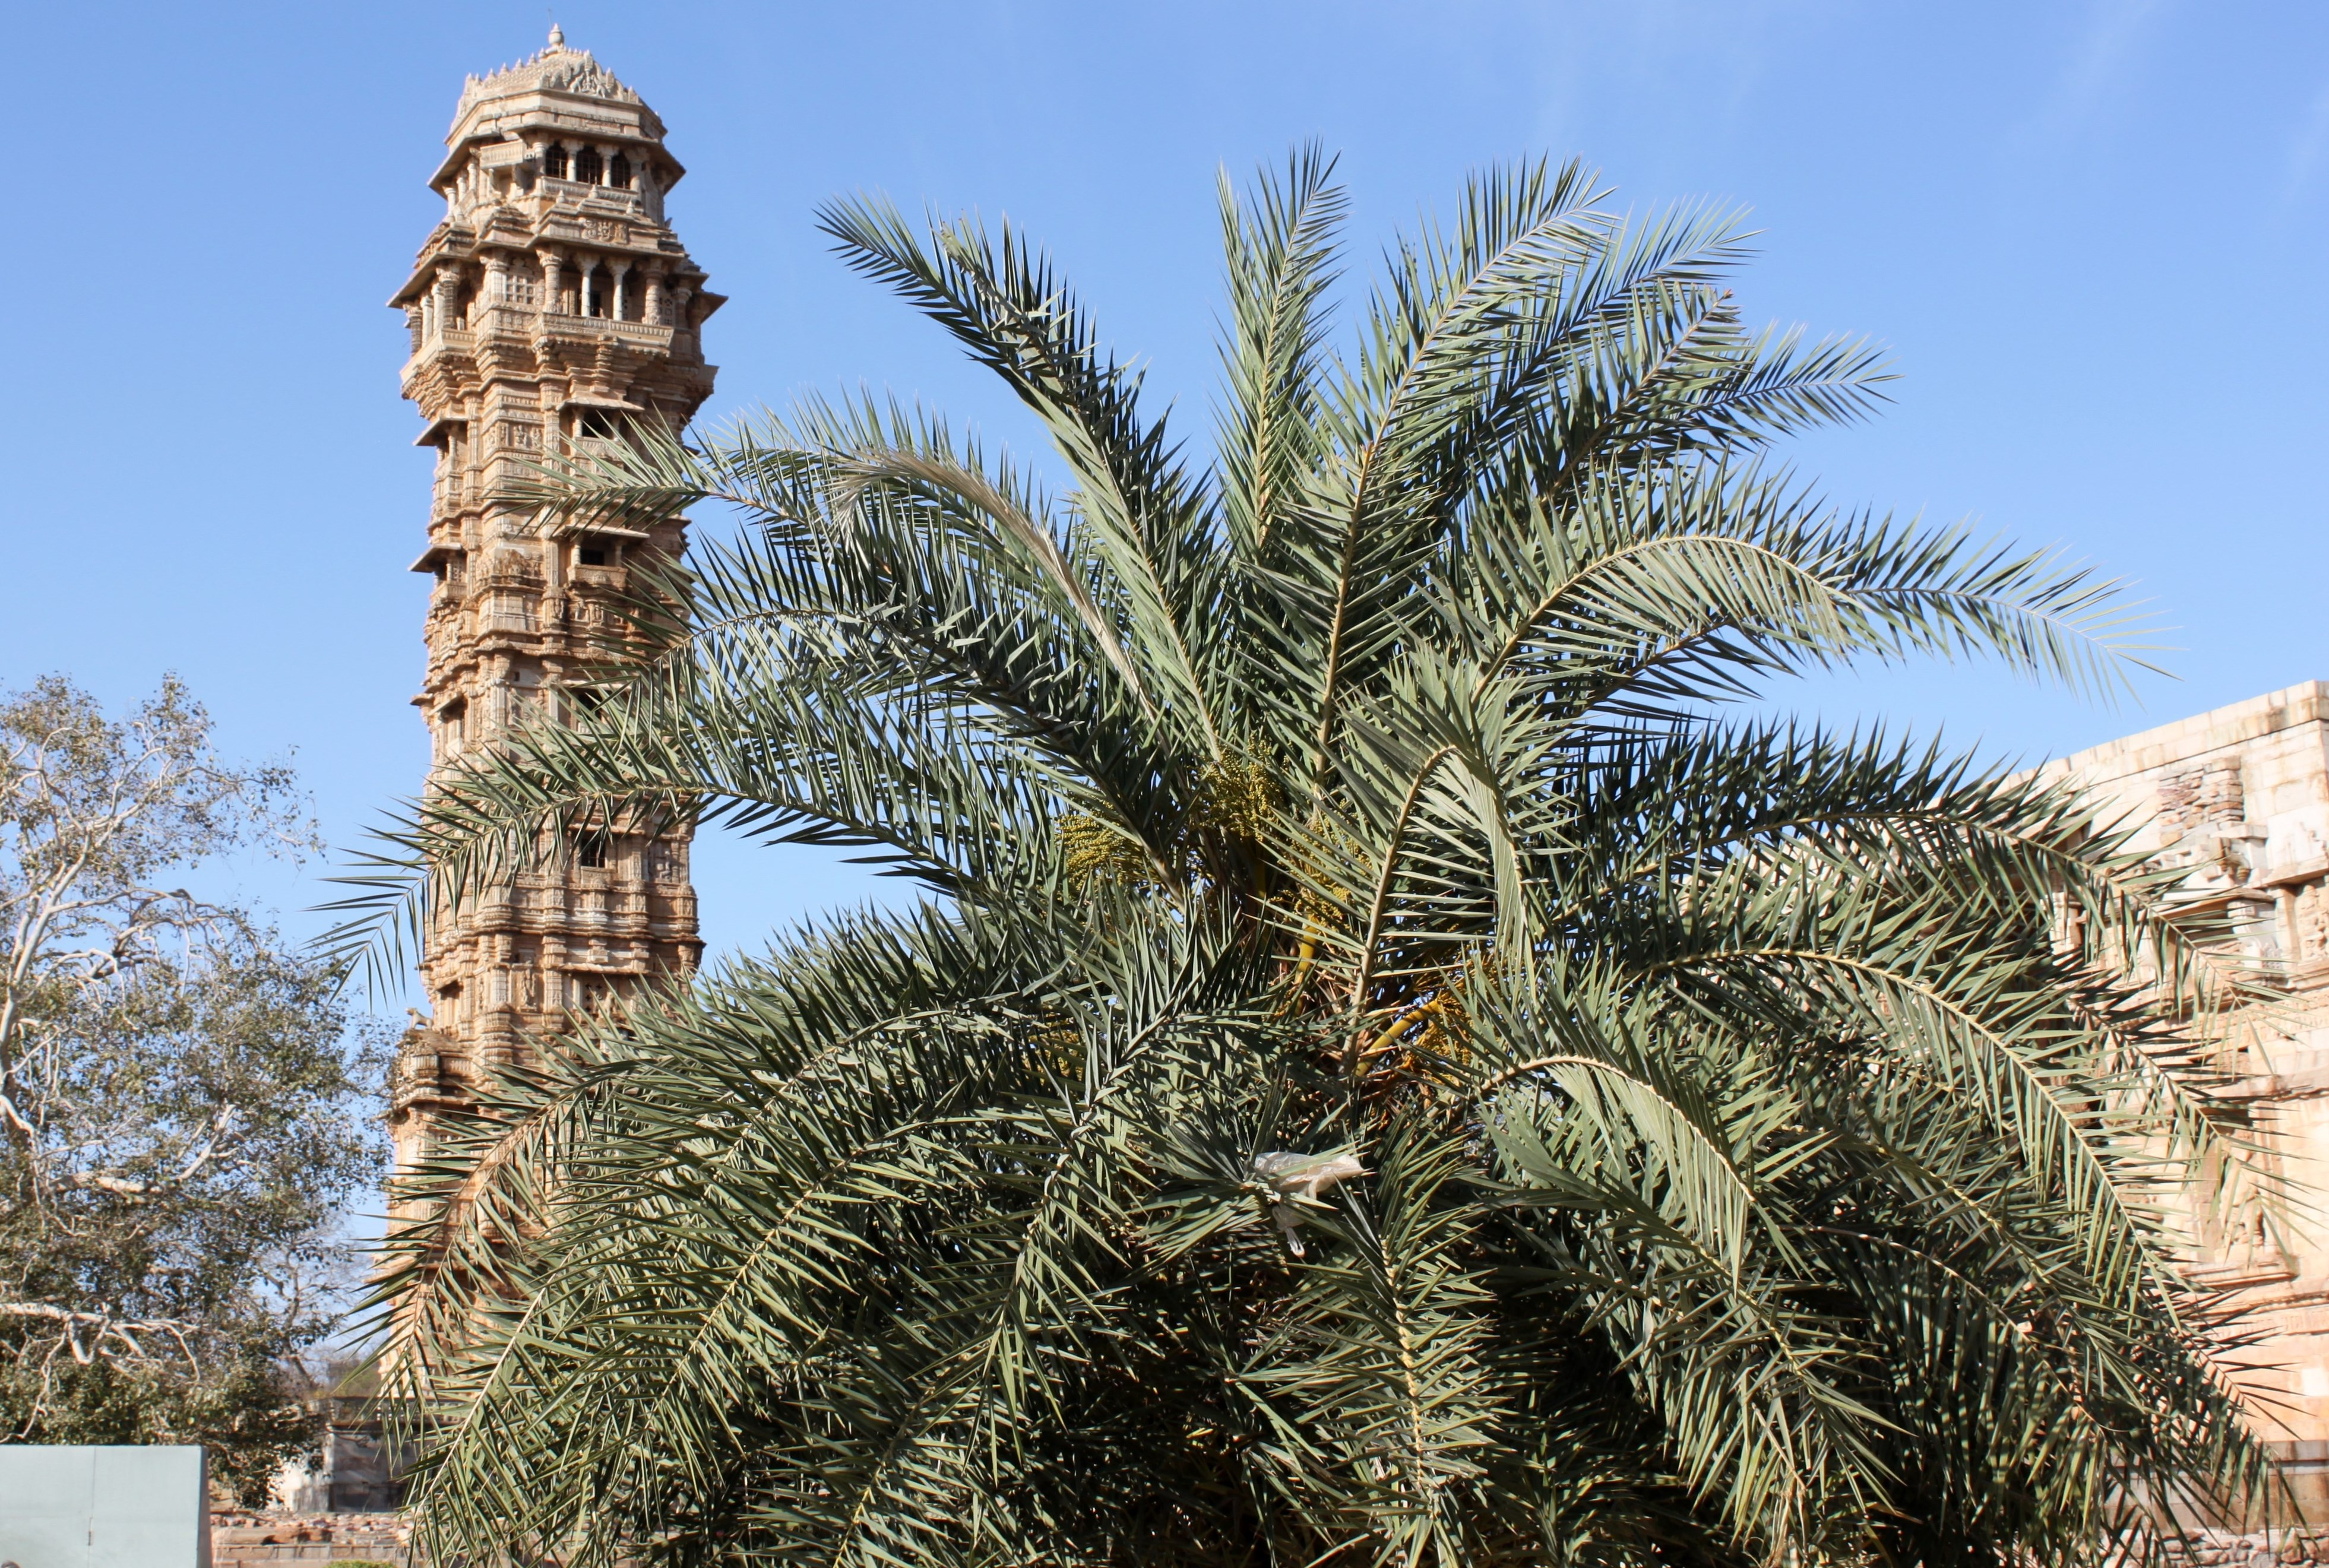 Vijay Stambha (Tower of Victory) 13